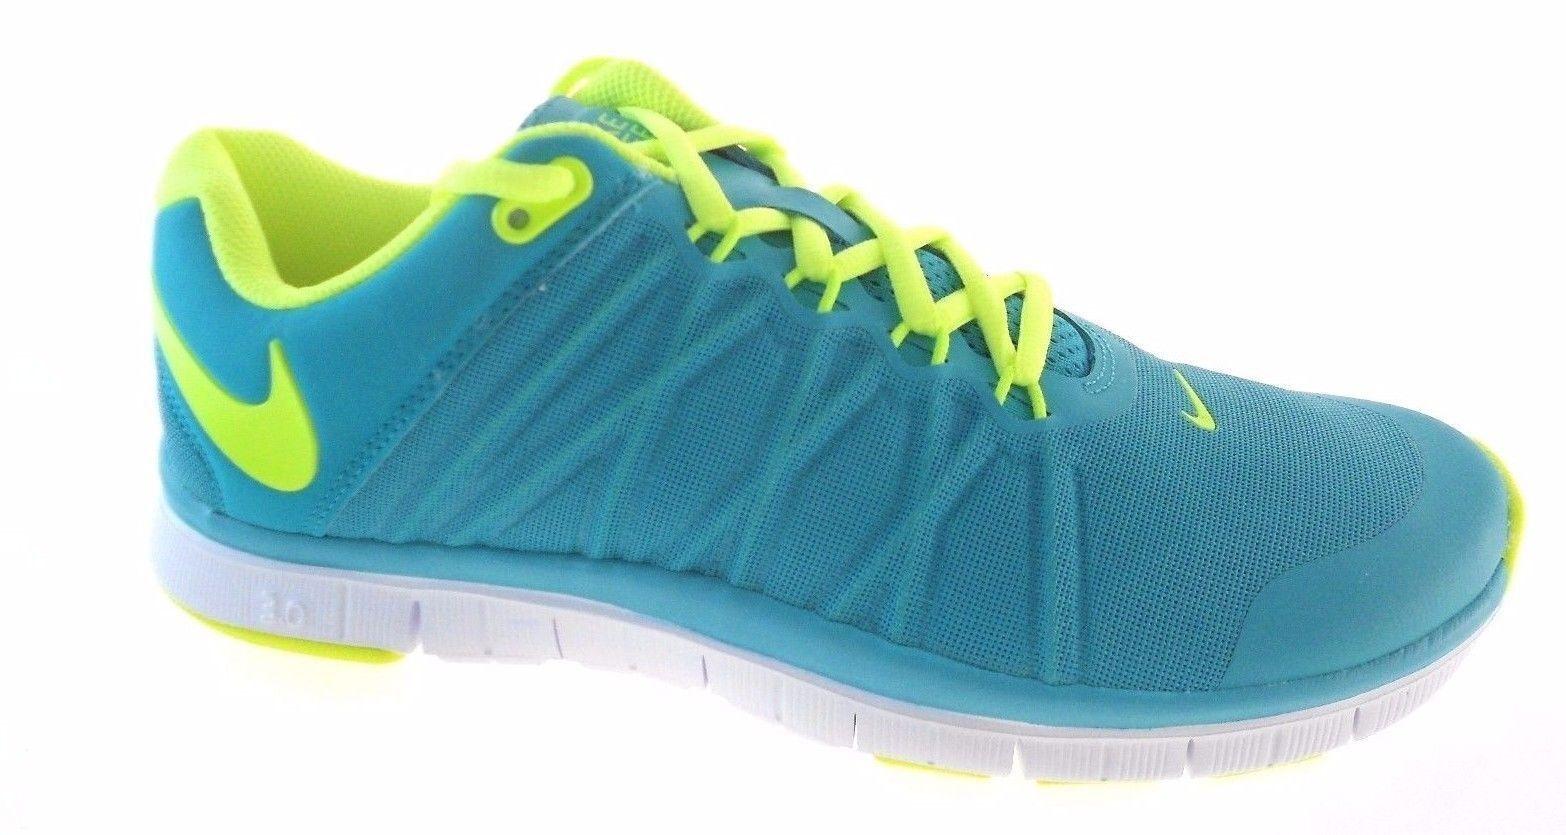 Nike free trainer 3.0 neu gr: 42,5: 9 t ü rkis gr ü n 5,0 presto - sommer